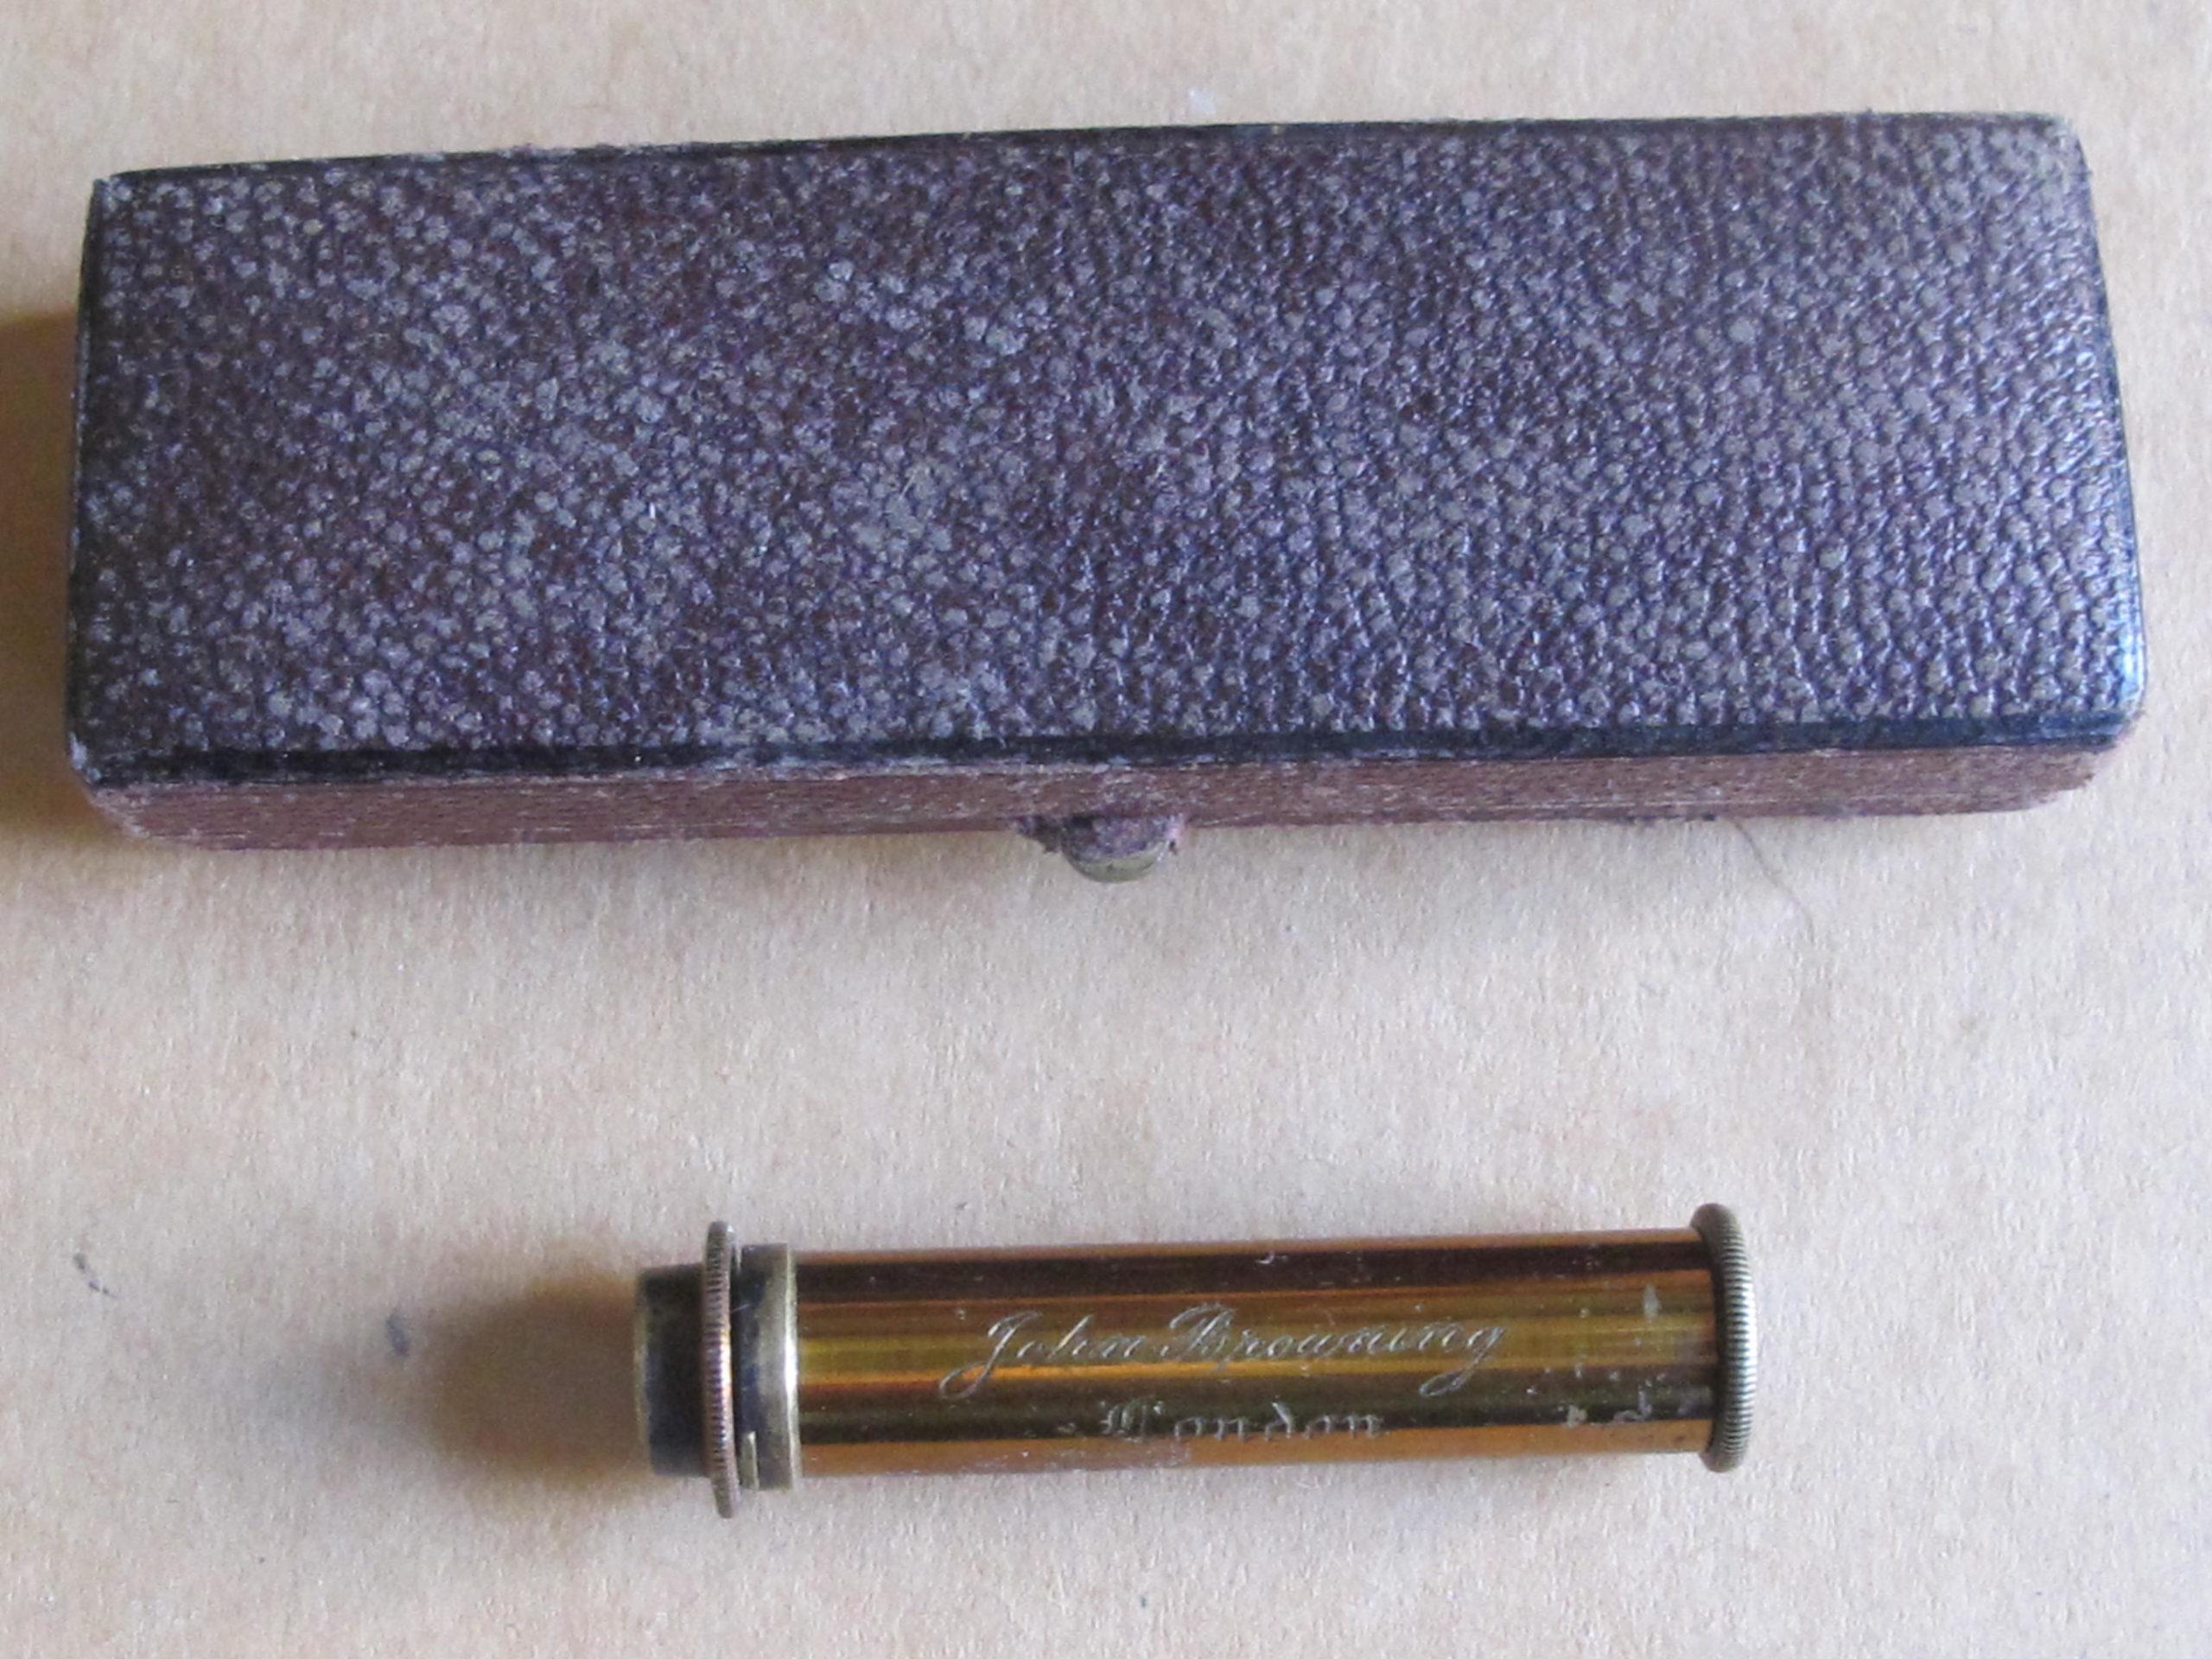 Miniature Spectroscope by John Browning, London